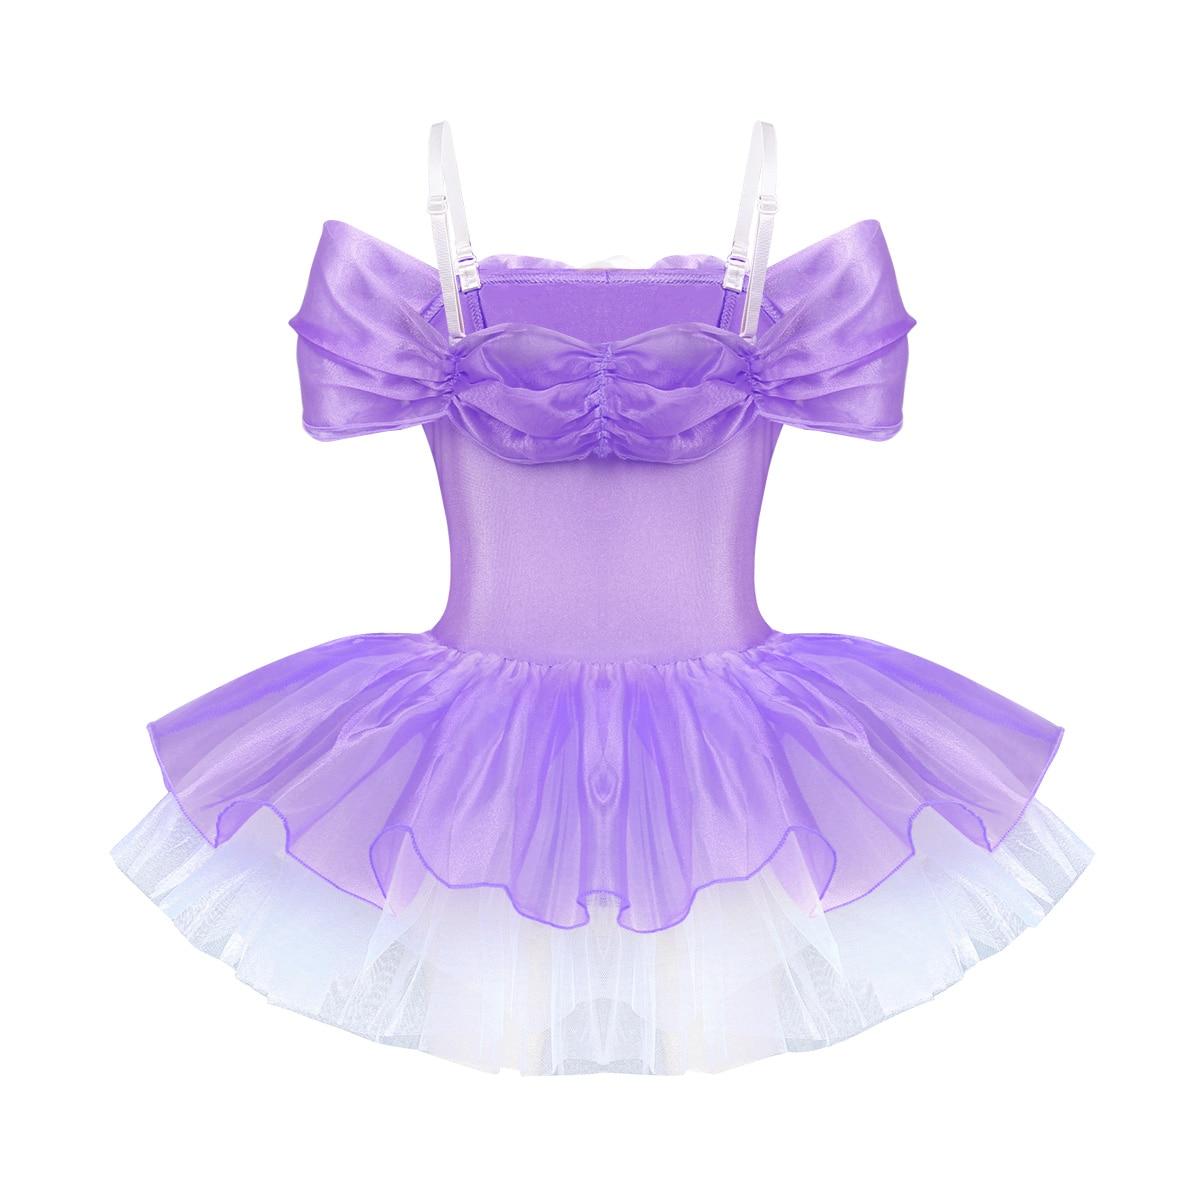 Velvet Leotard Dance Costume Princess Costume Halloween Girls Dance Costume Leotard Ballet Flower Costume Tutu Ballet Costume